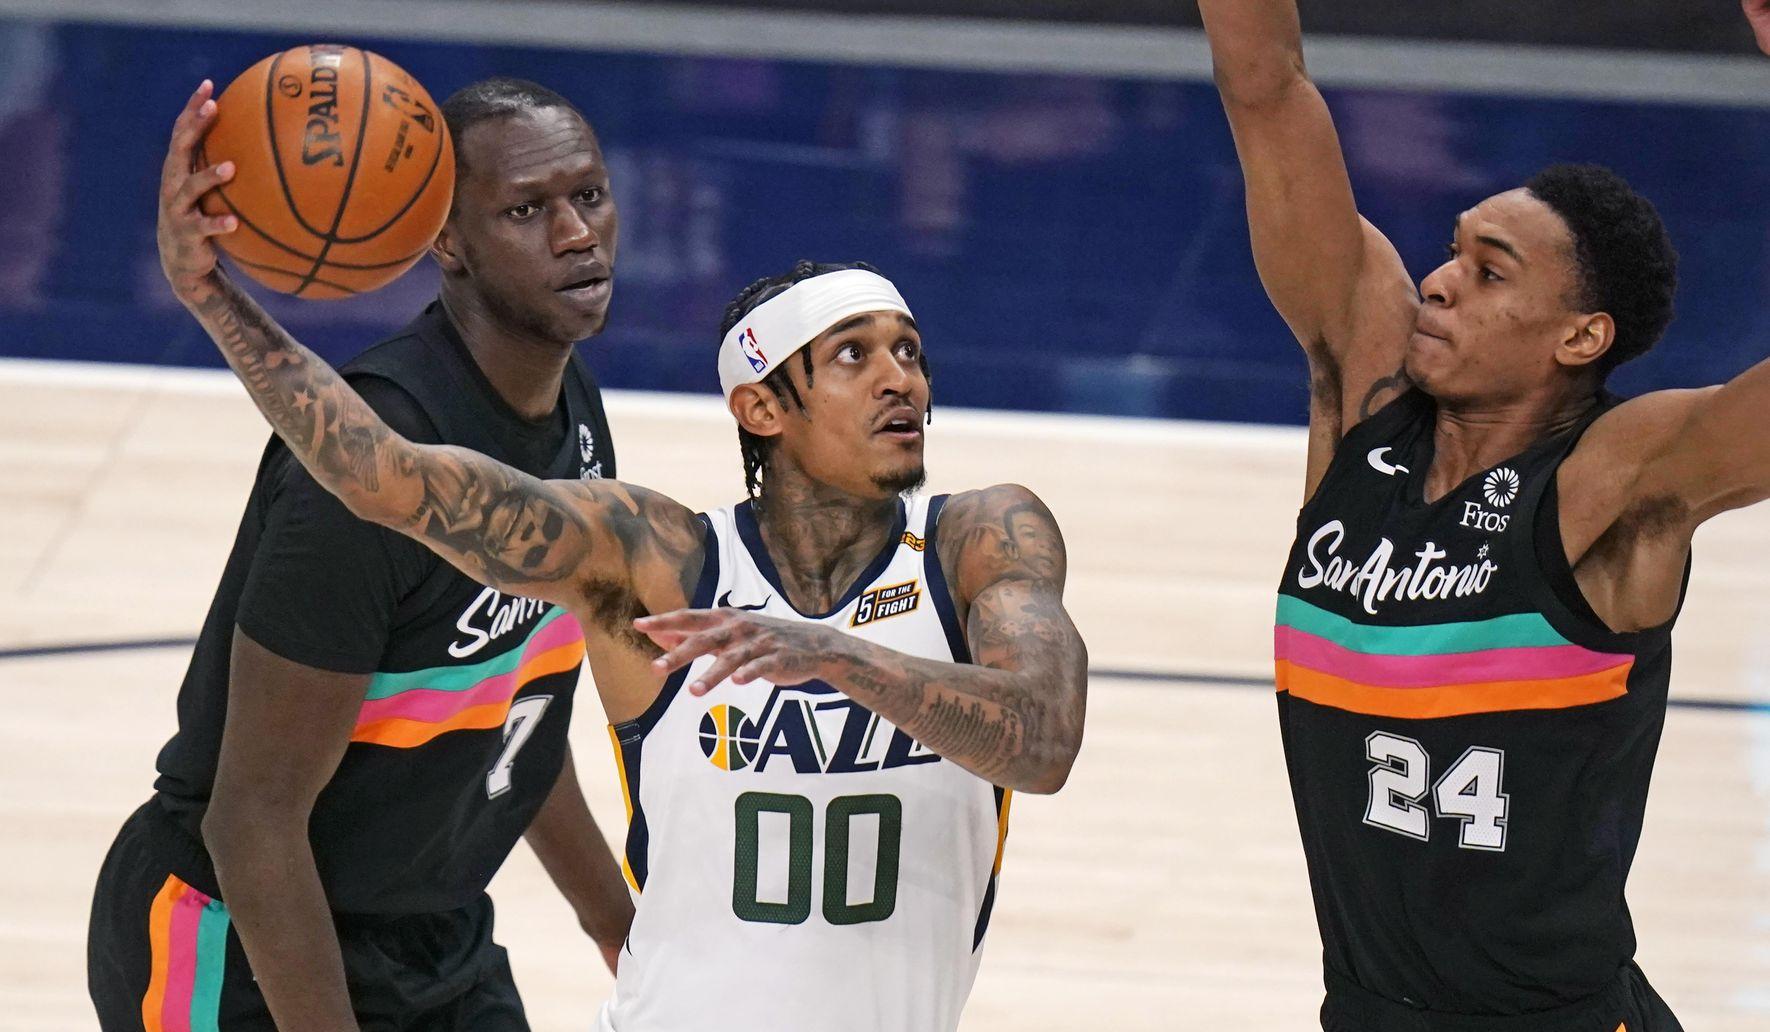 Spurs_jazz_basketball_38705_c0-226-5400-3374_s1770x1032